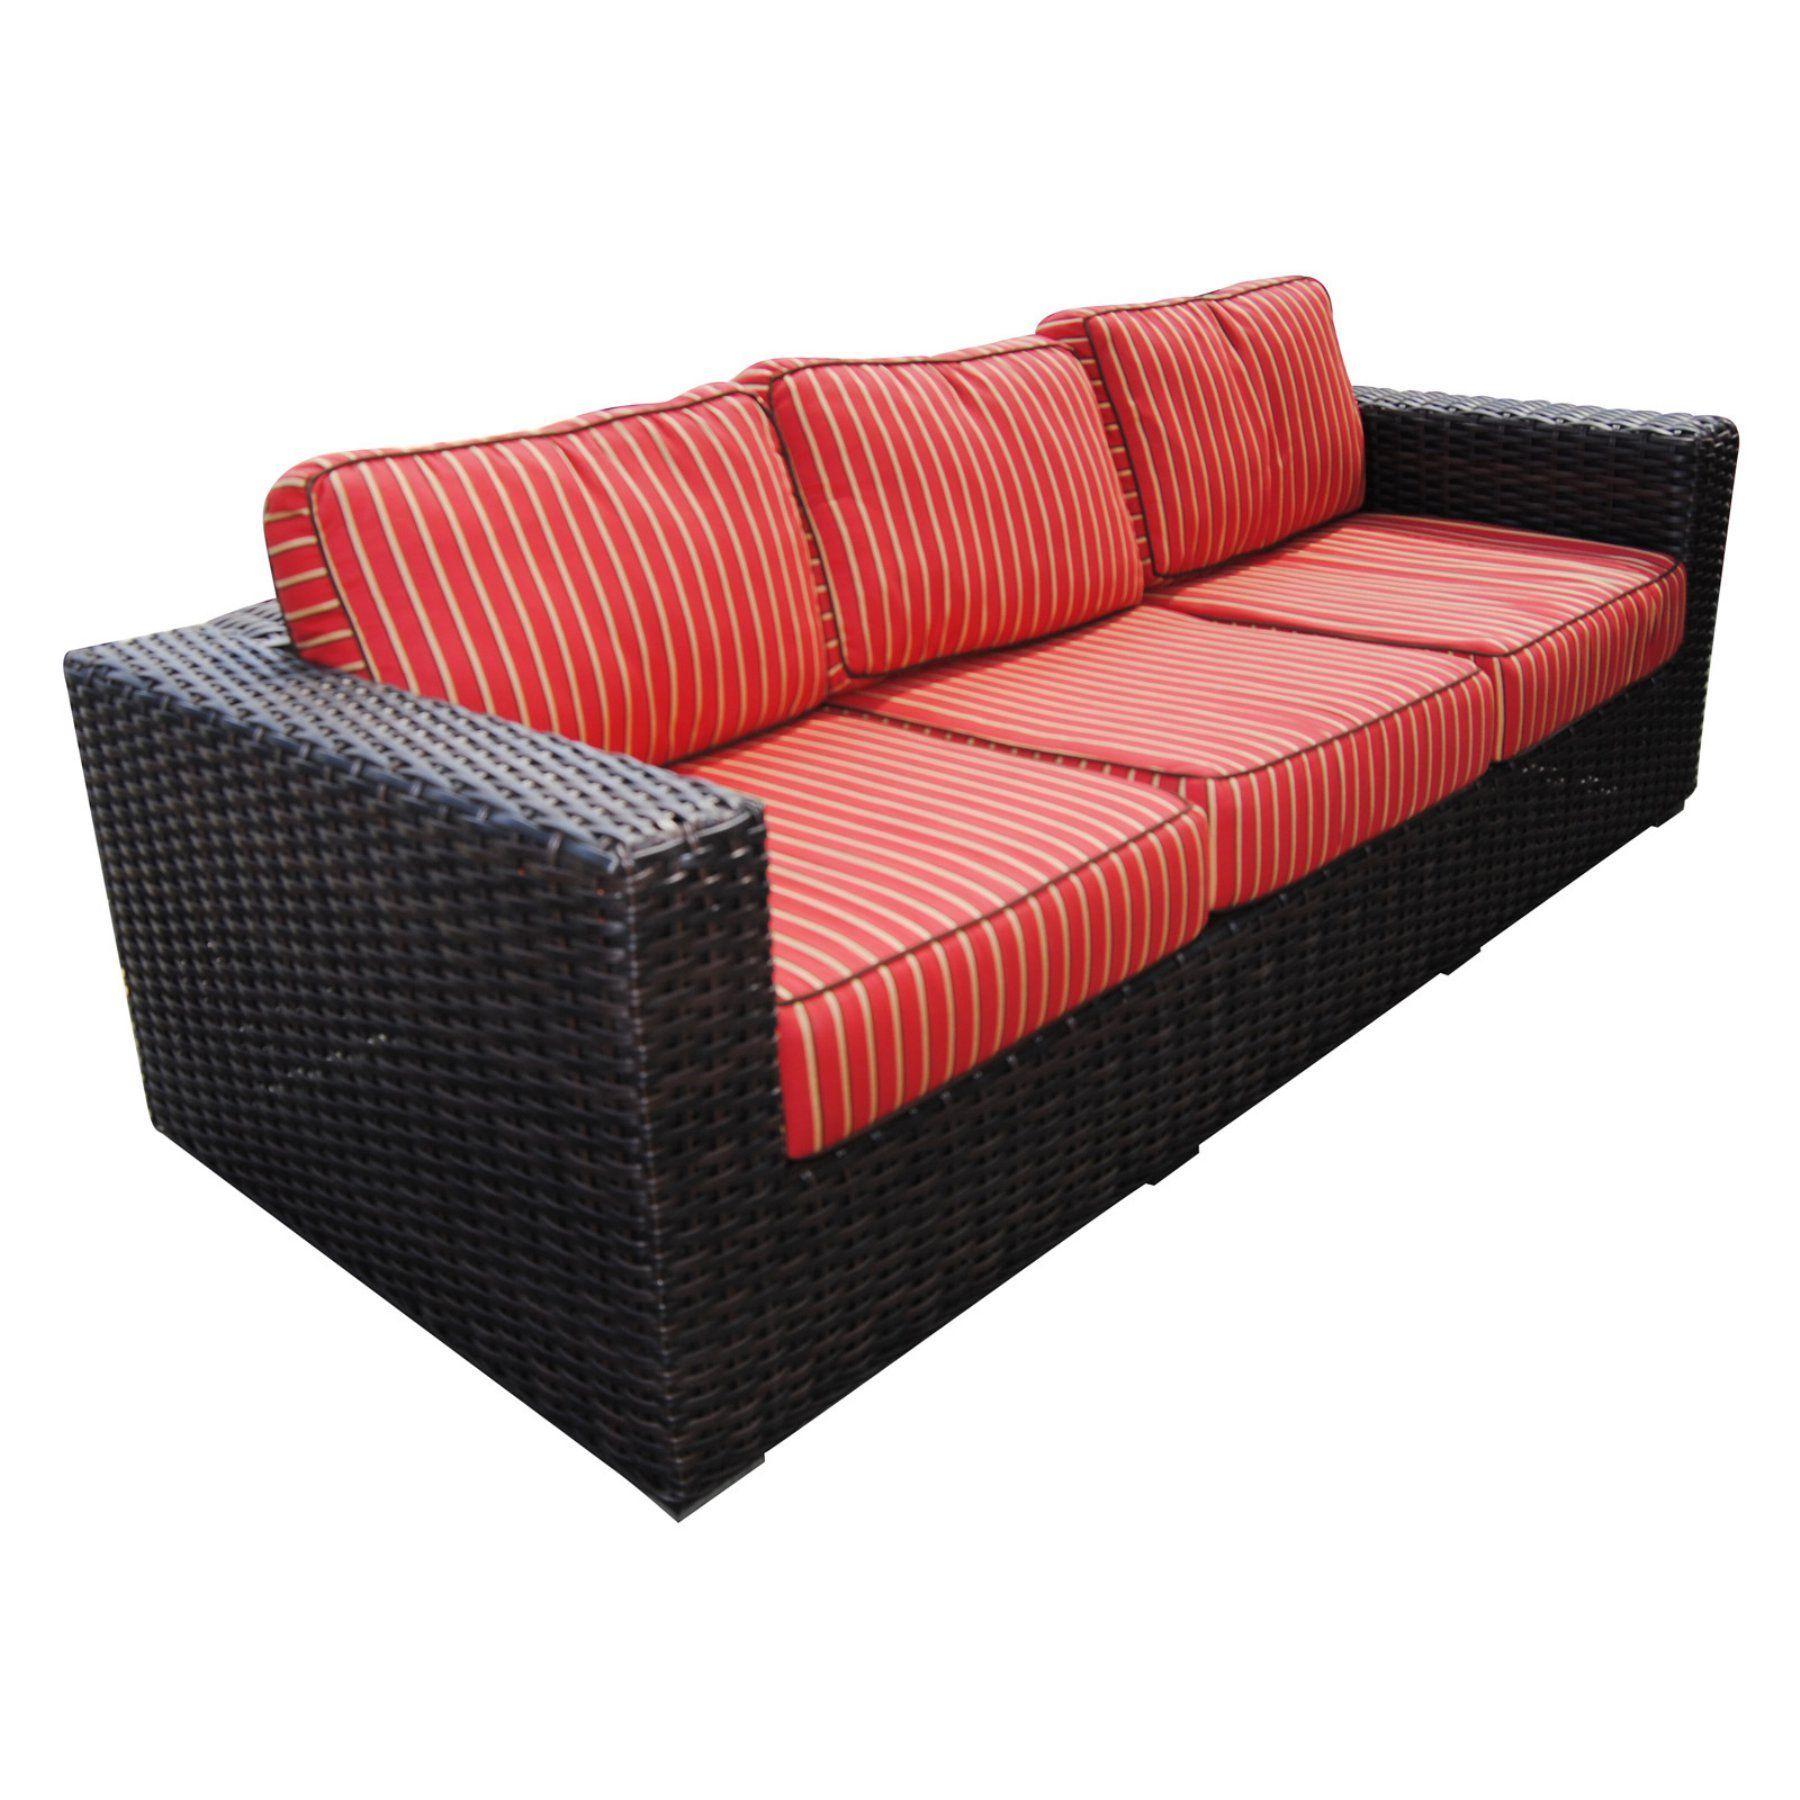 Shae Designs Patio Furniture Marierogetcom